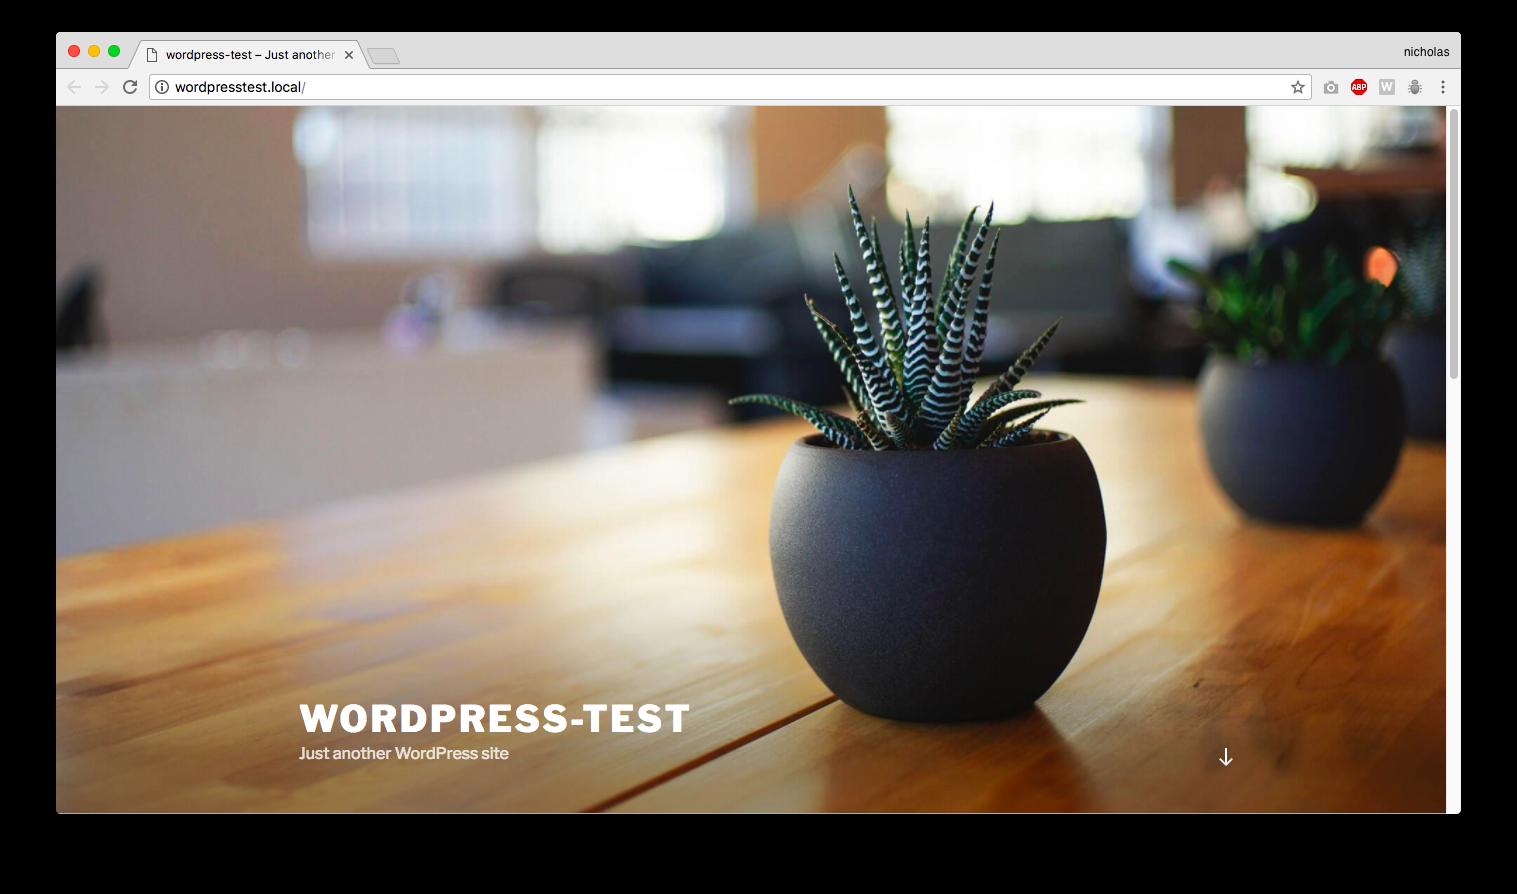 wordpress test